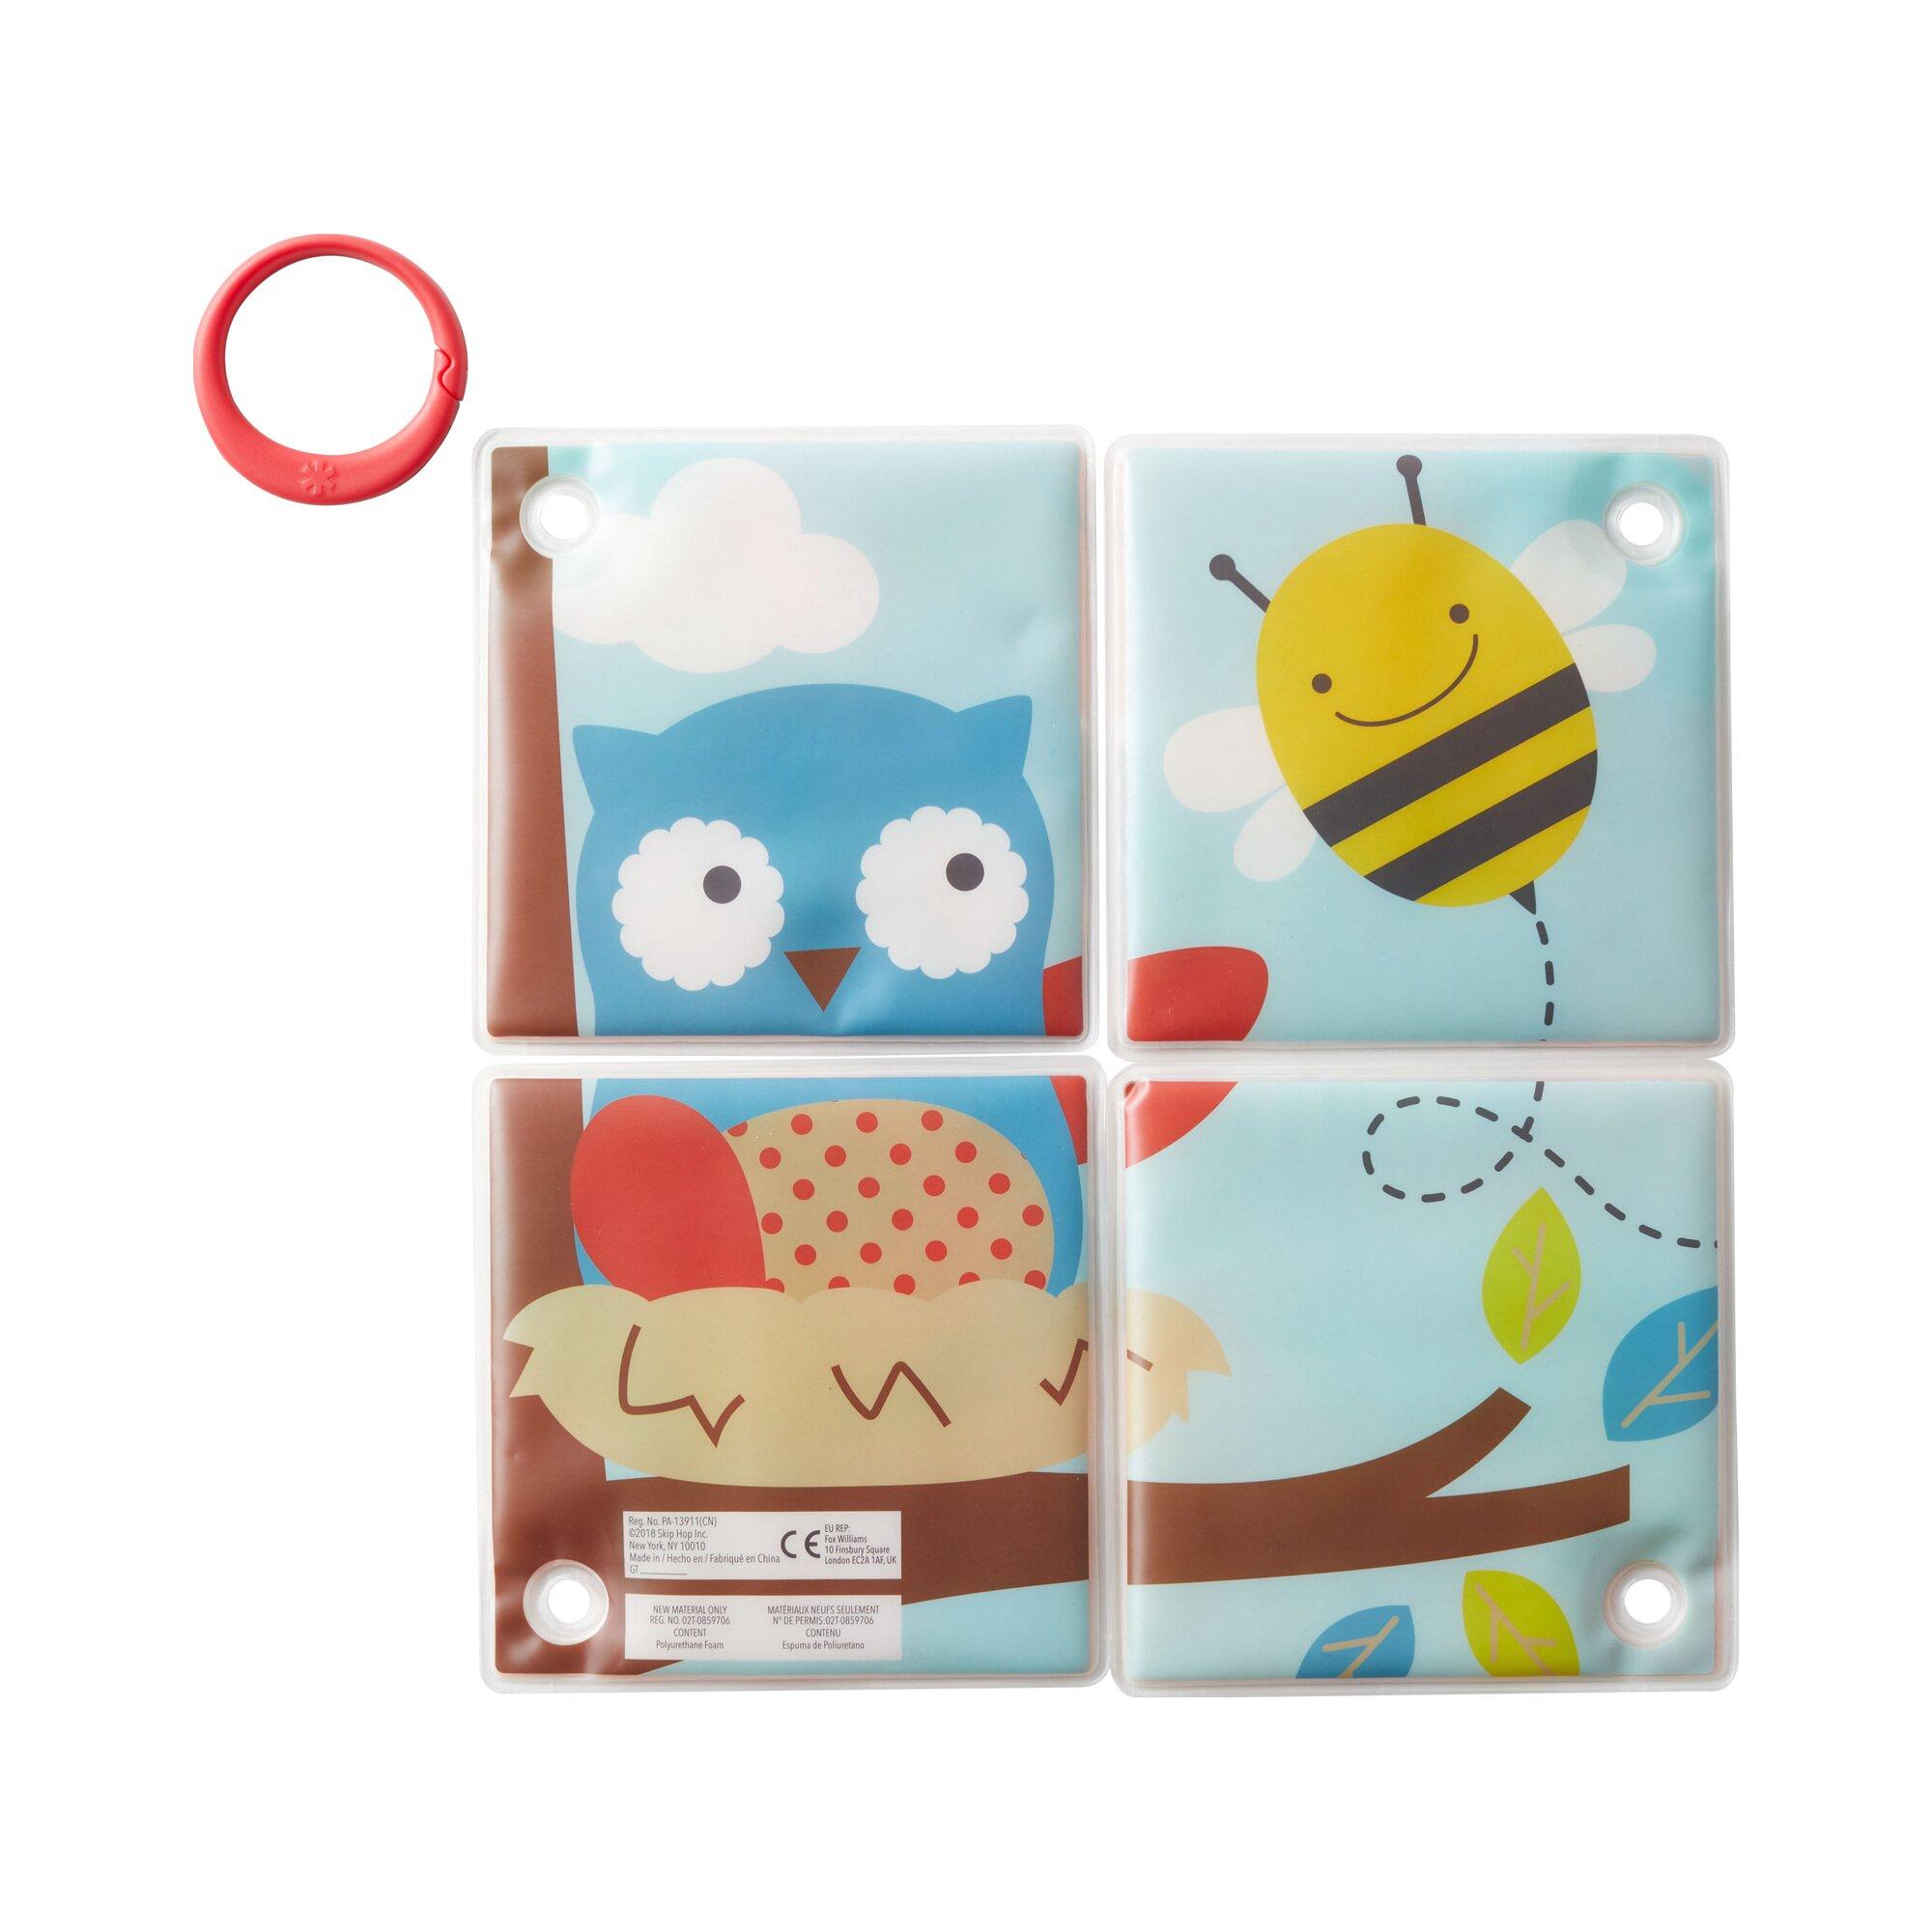 skip-hop-badespielzeug-puzzlebuch